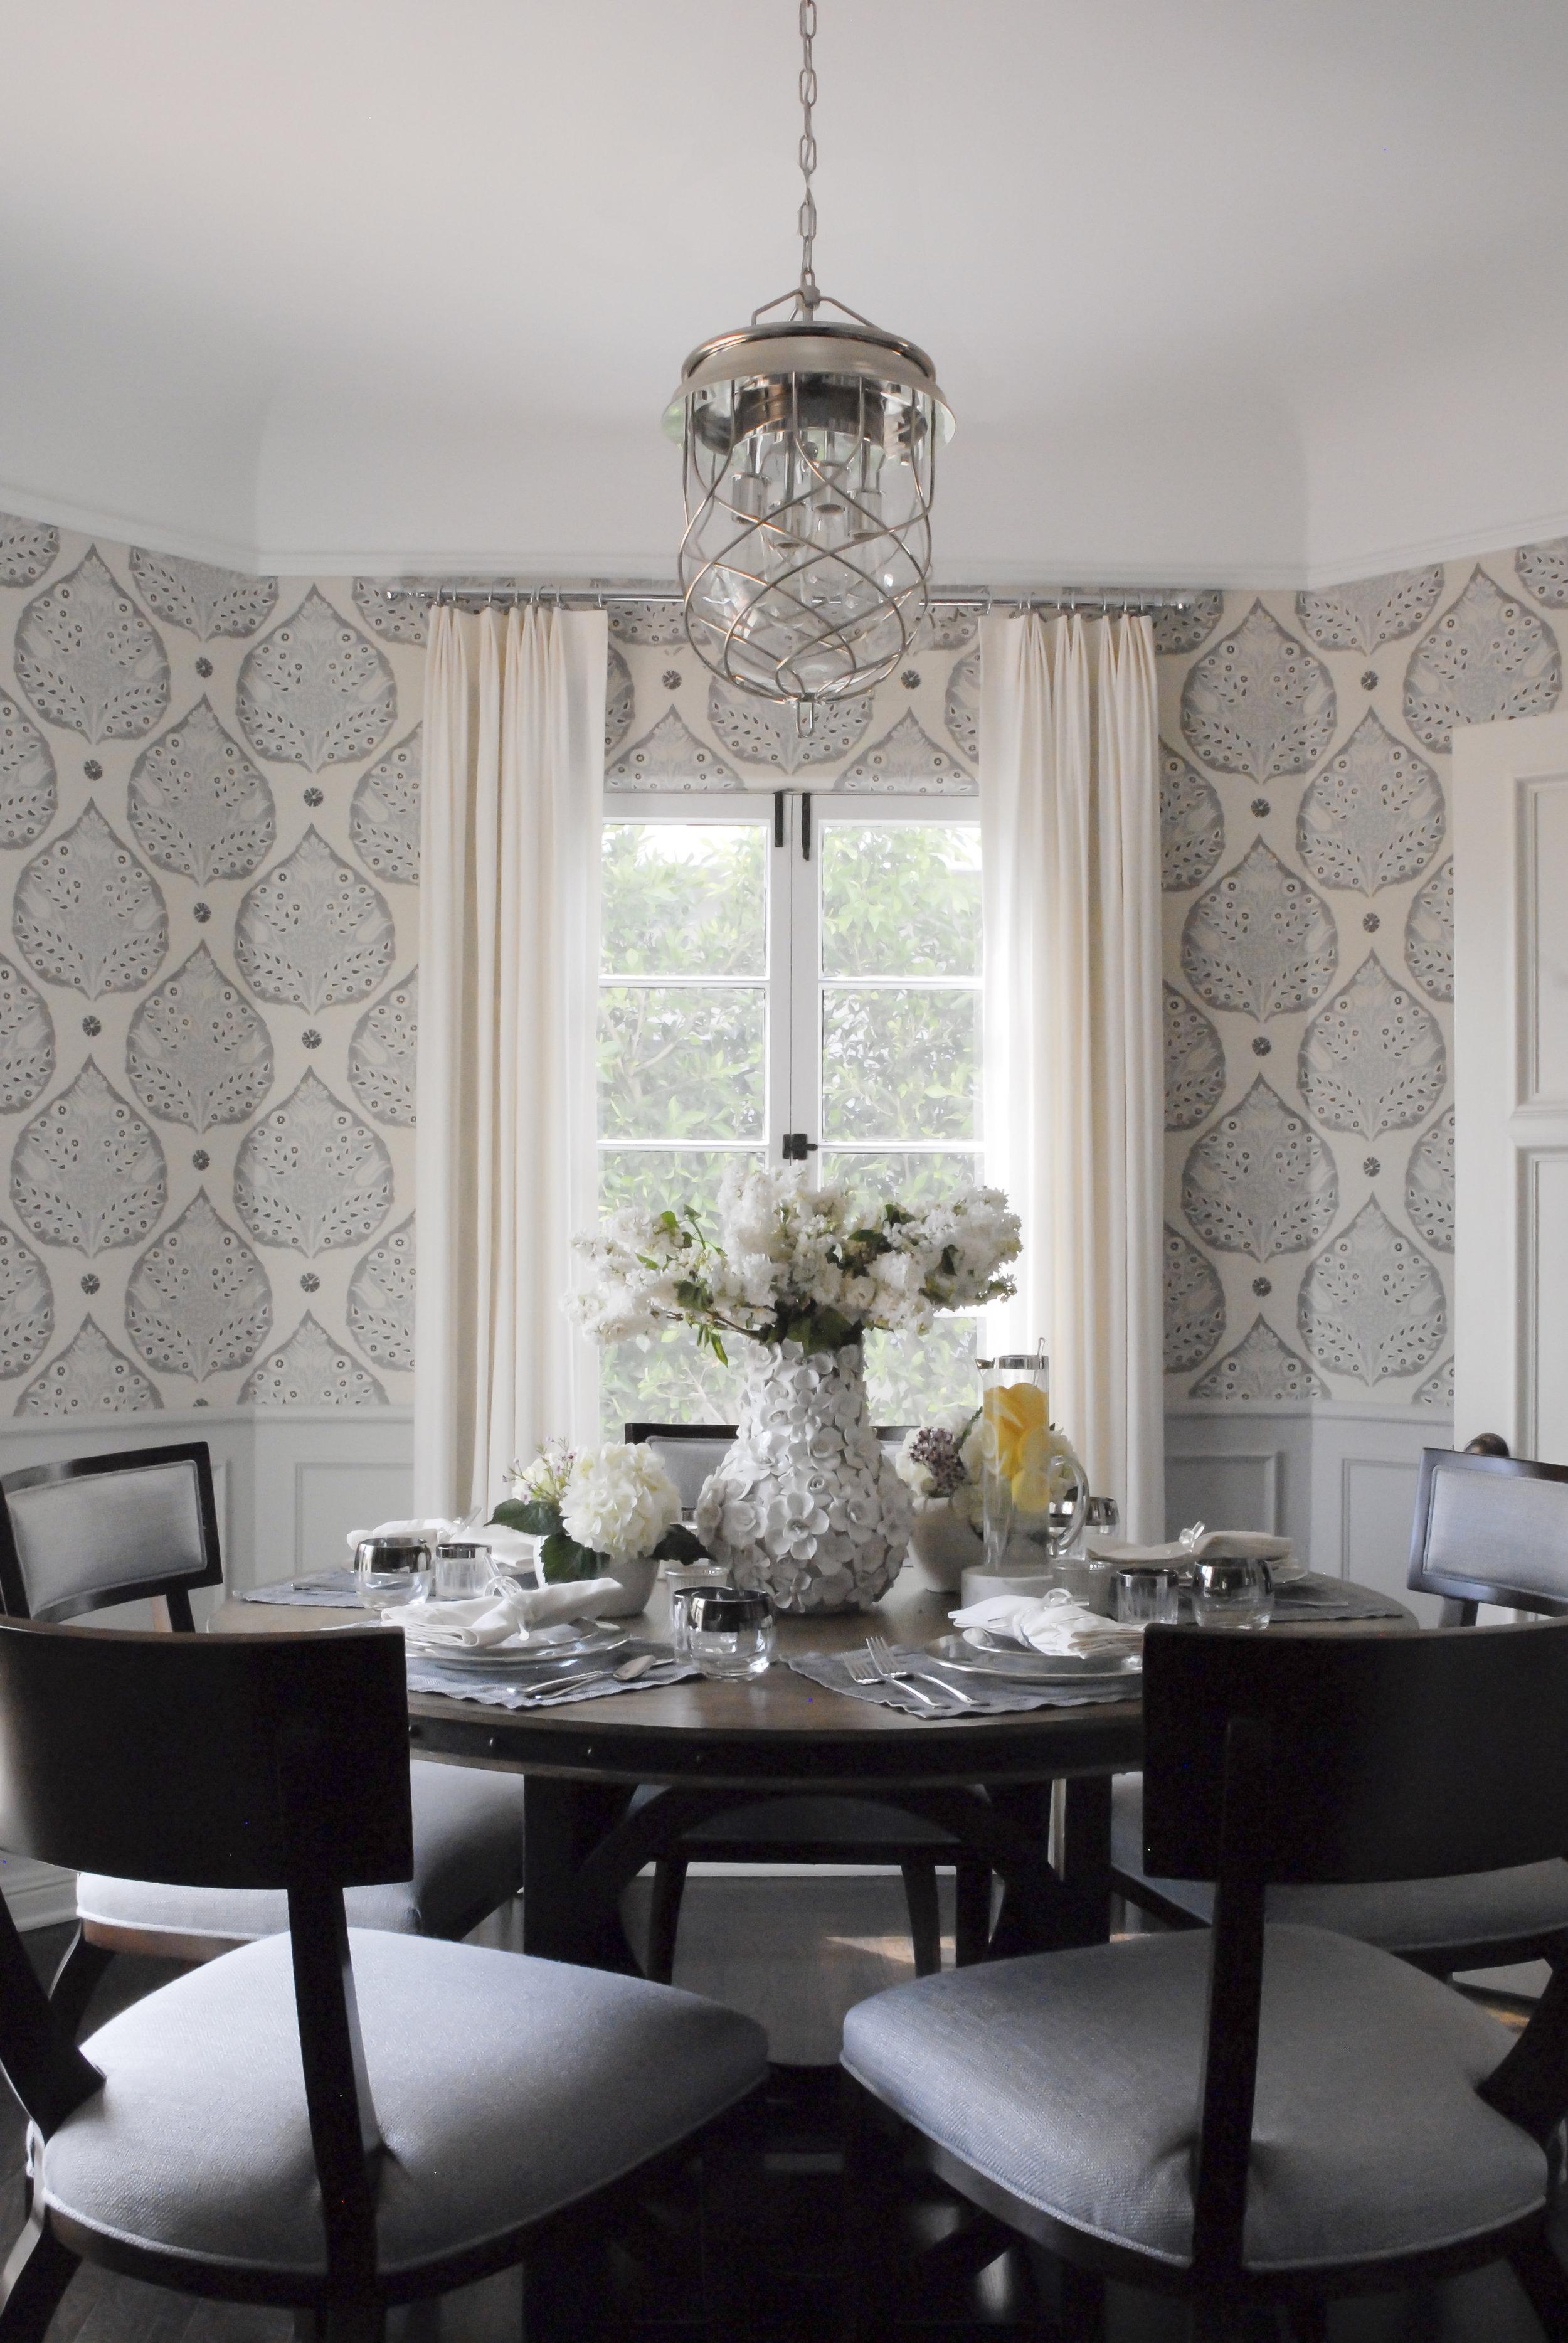 DV-McCarty-Breakfast Room 1.jpg